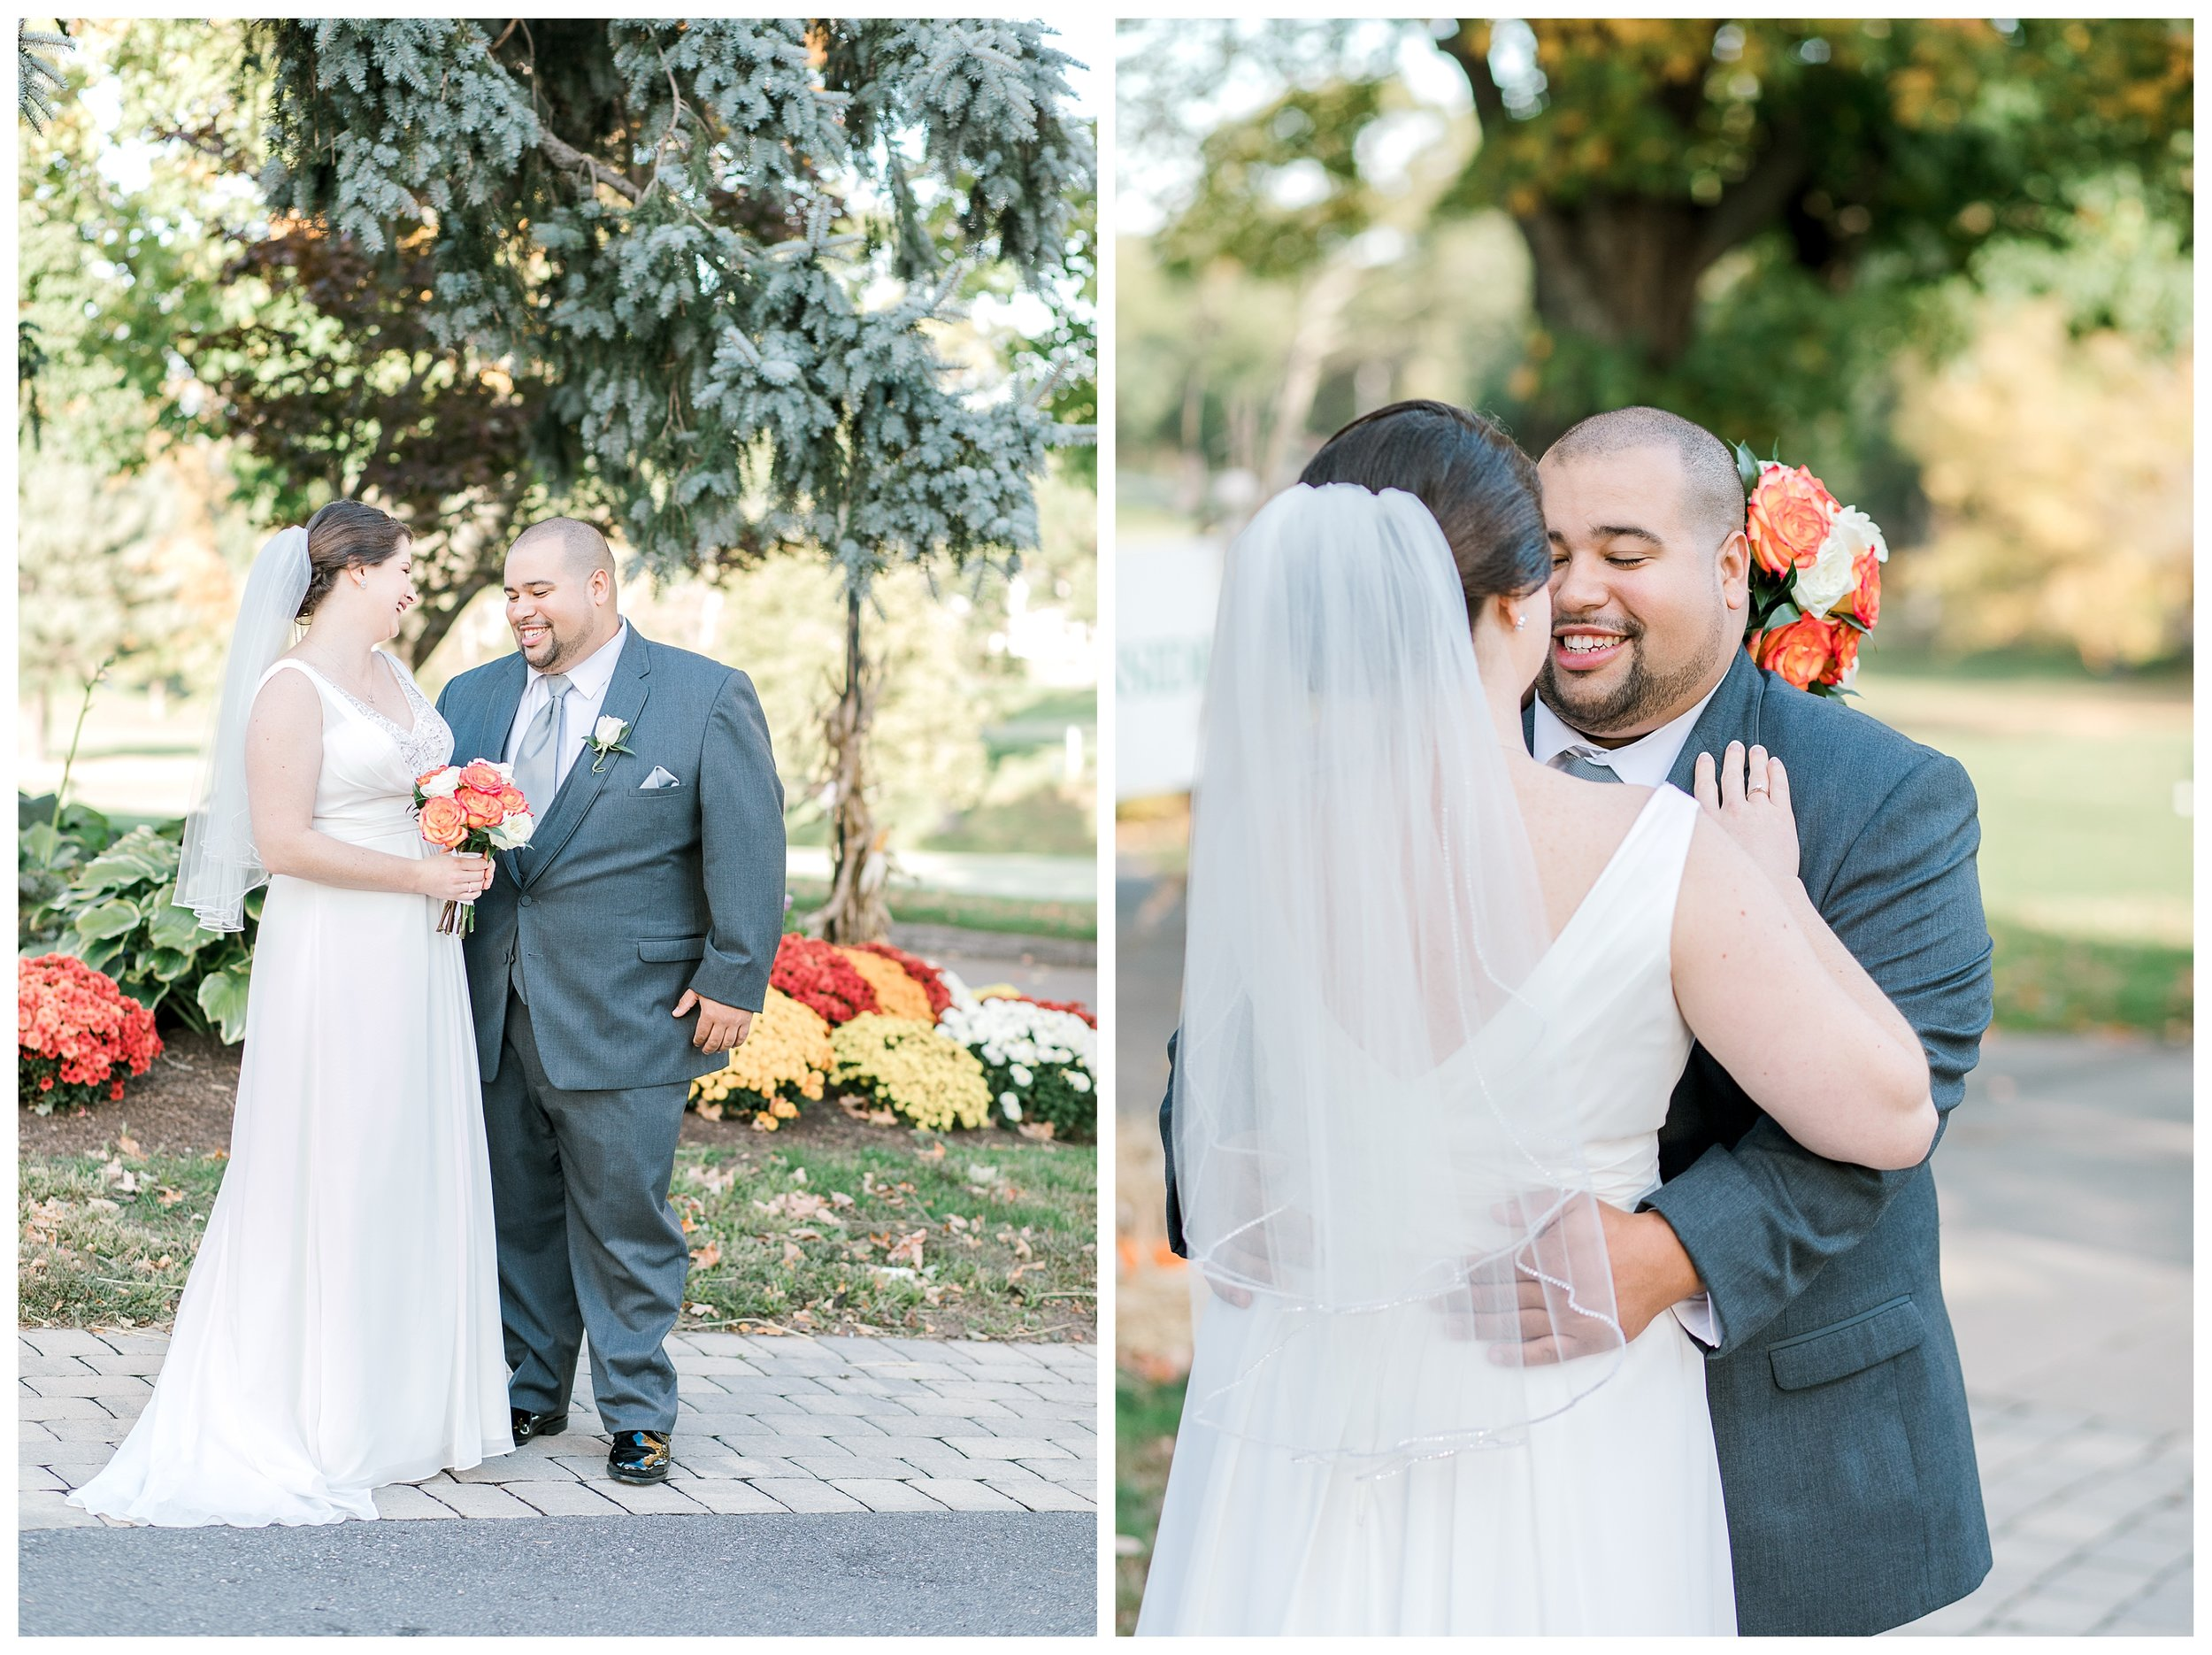 pleasant_valley_country_club_wedding_sutton_erica_pezente_photography (22).jpg